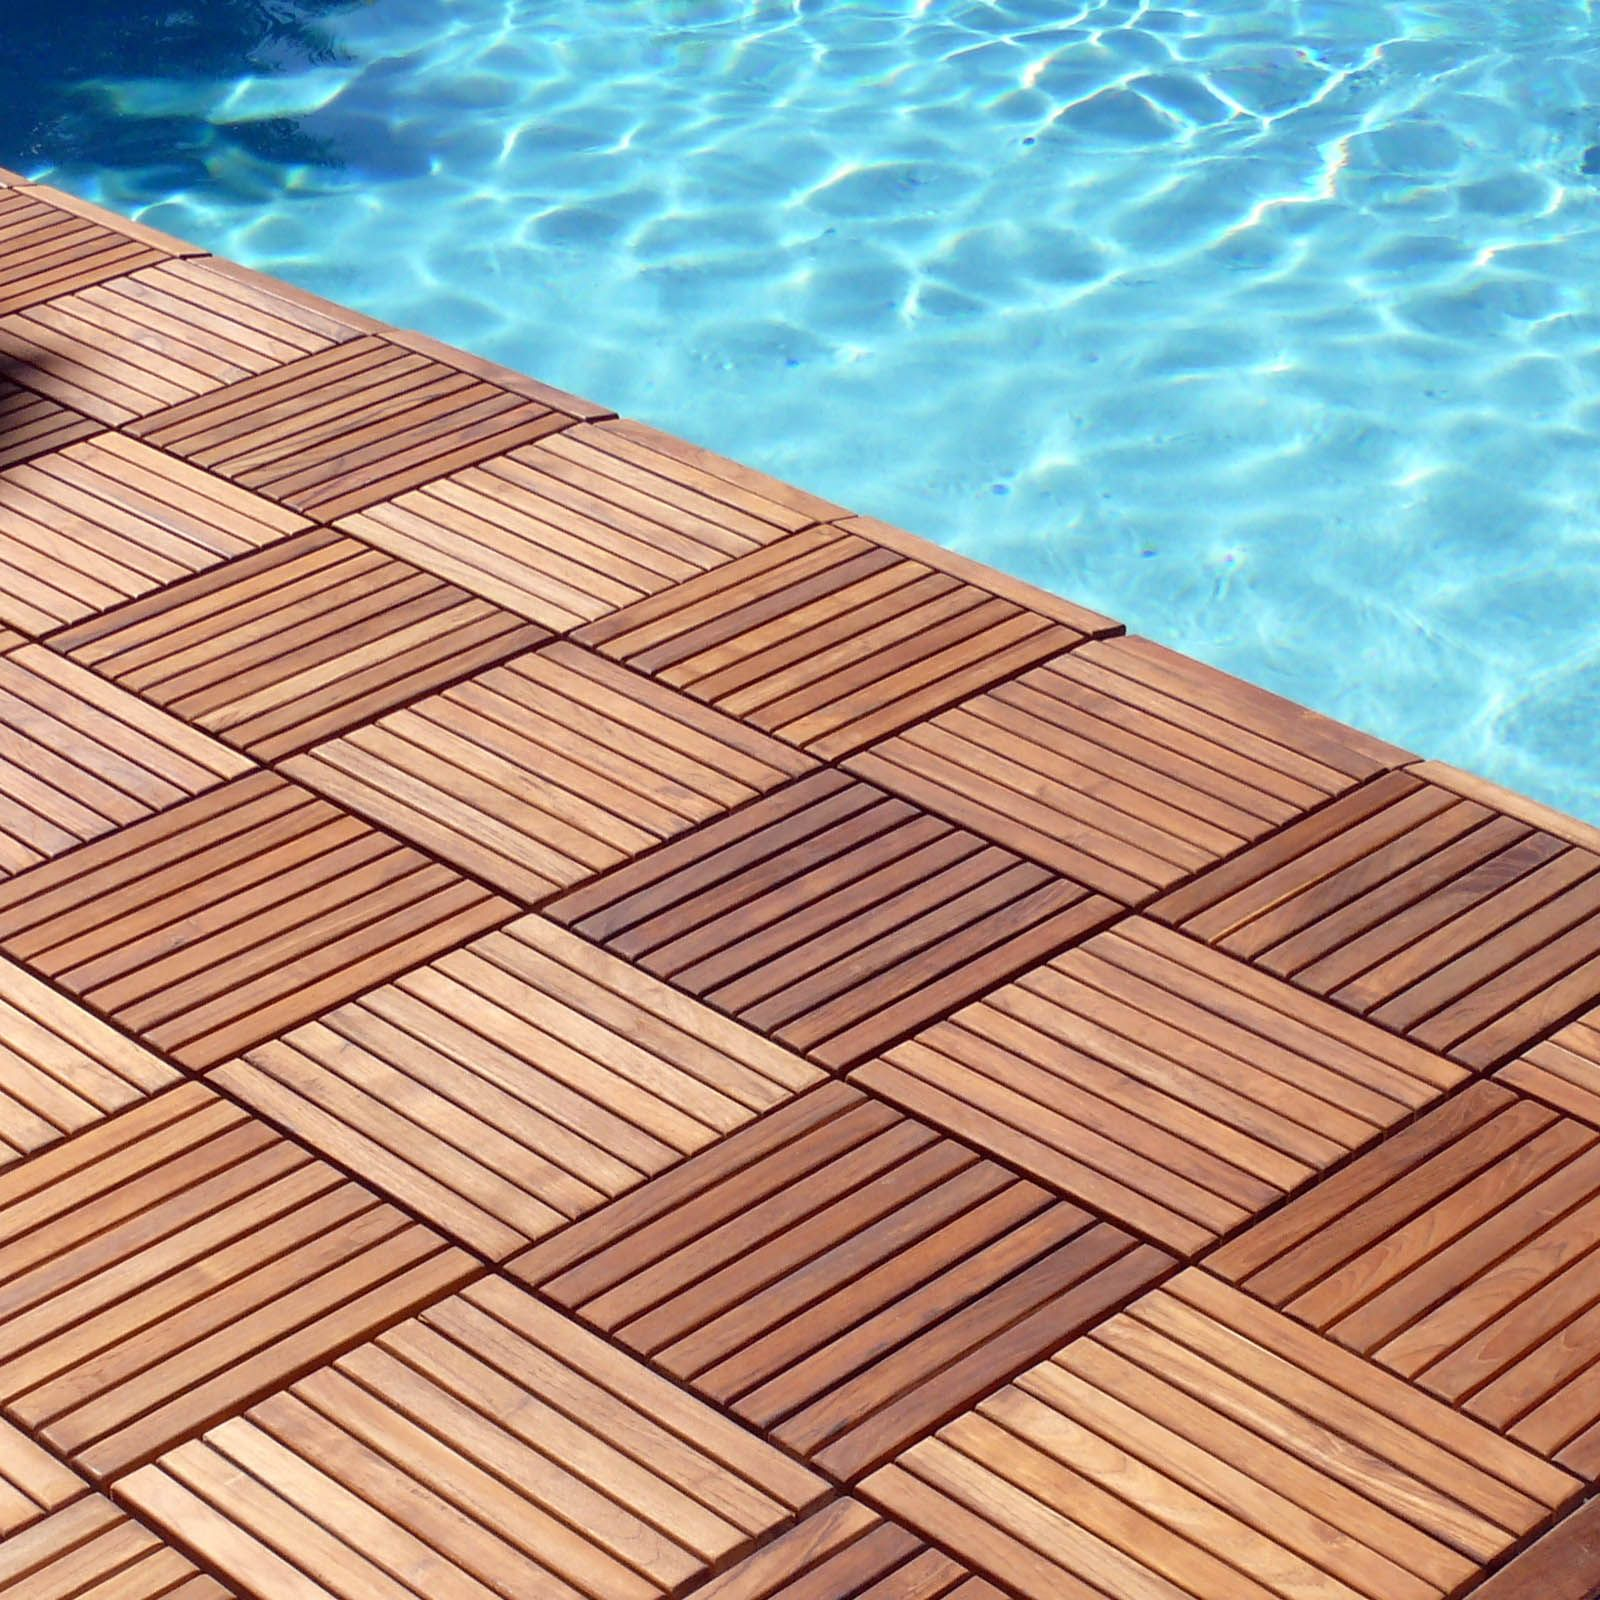 Le Click Interlocking Floor Tiles Teak Wood Clic In Outdoor Flooring